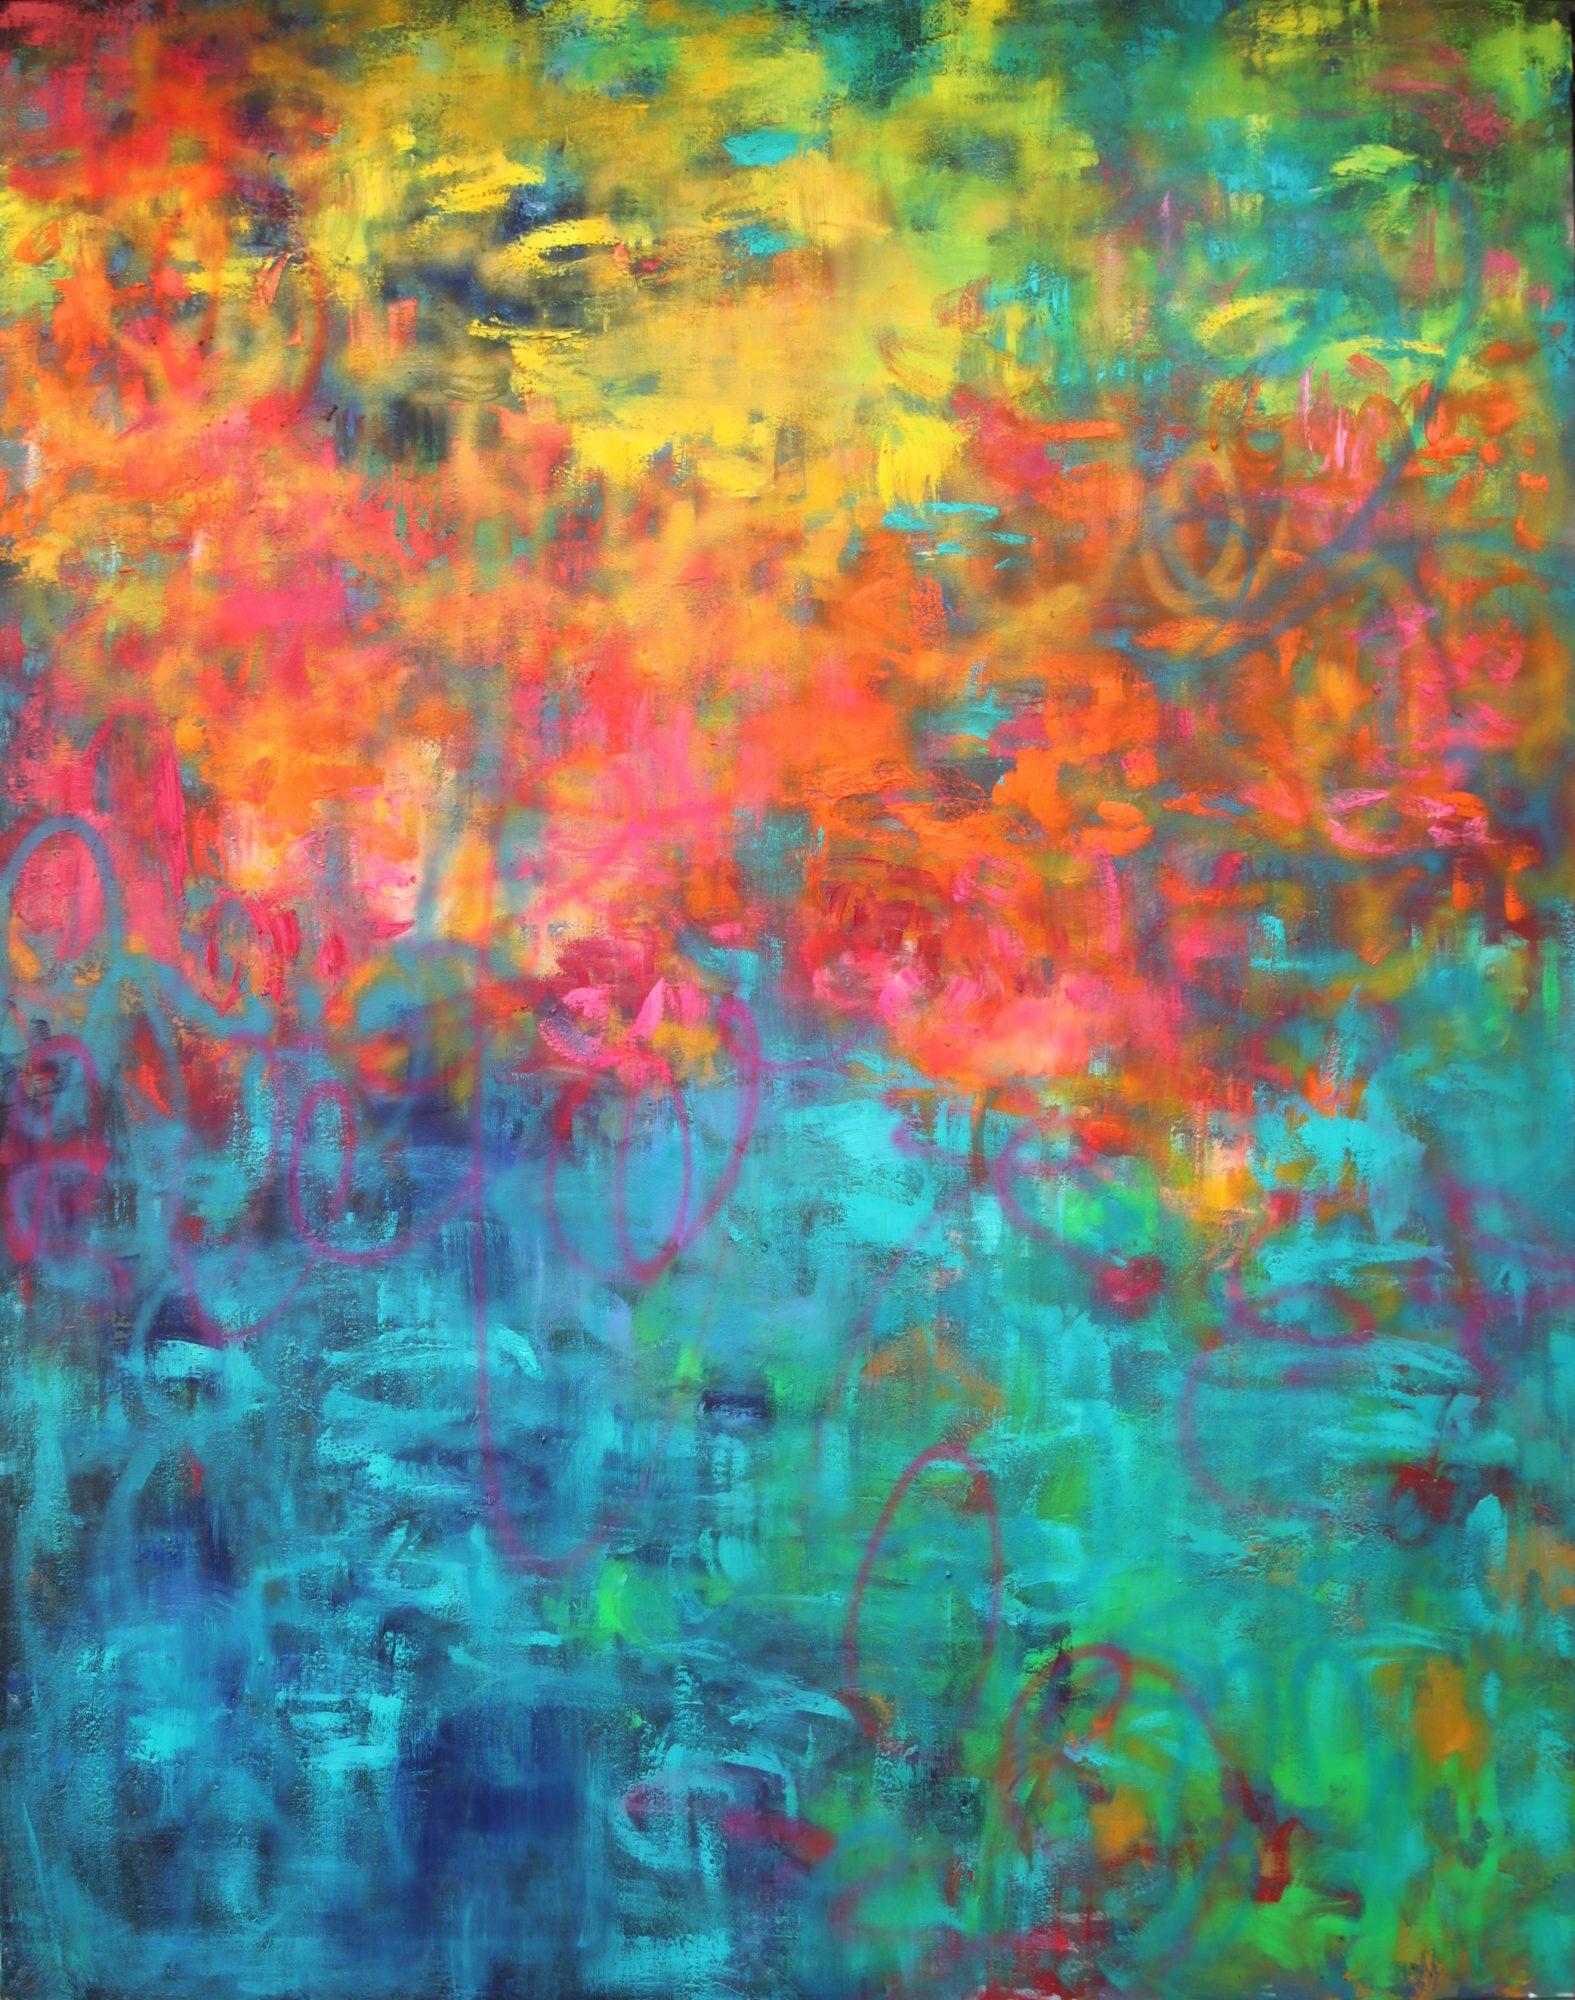 belinda-nadwie-art-abstract-artist-love life 4